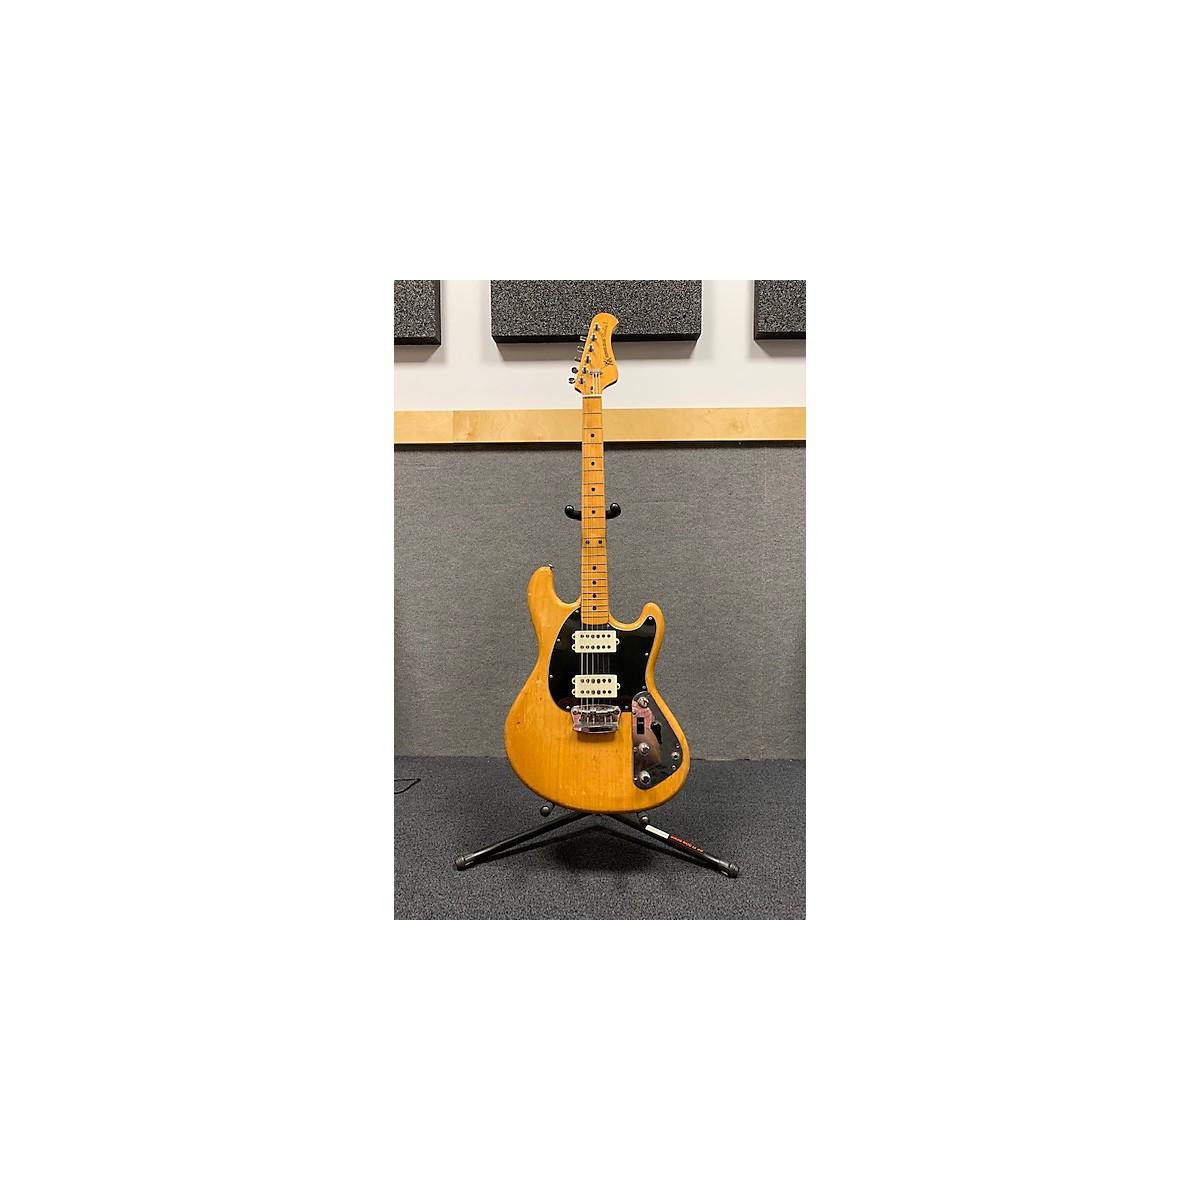 Ernie Ball Music Man 1976 Music Man I Solid Body Electric Guitar